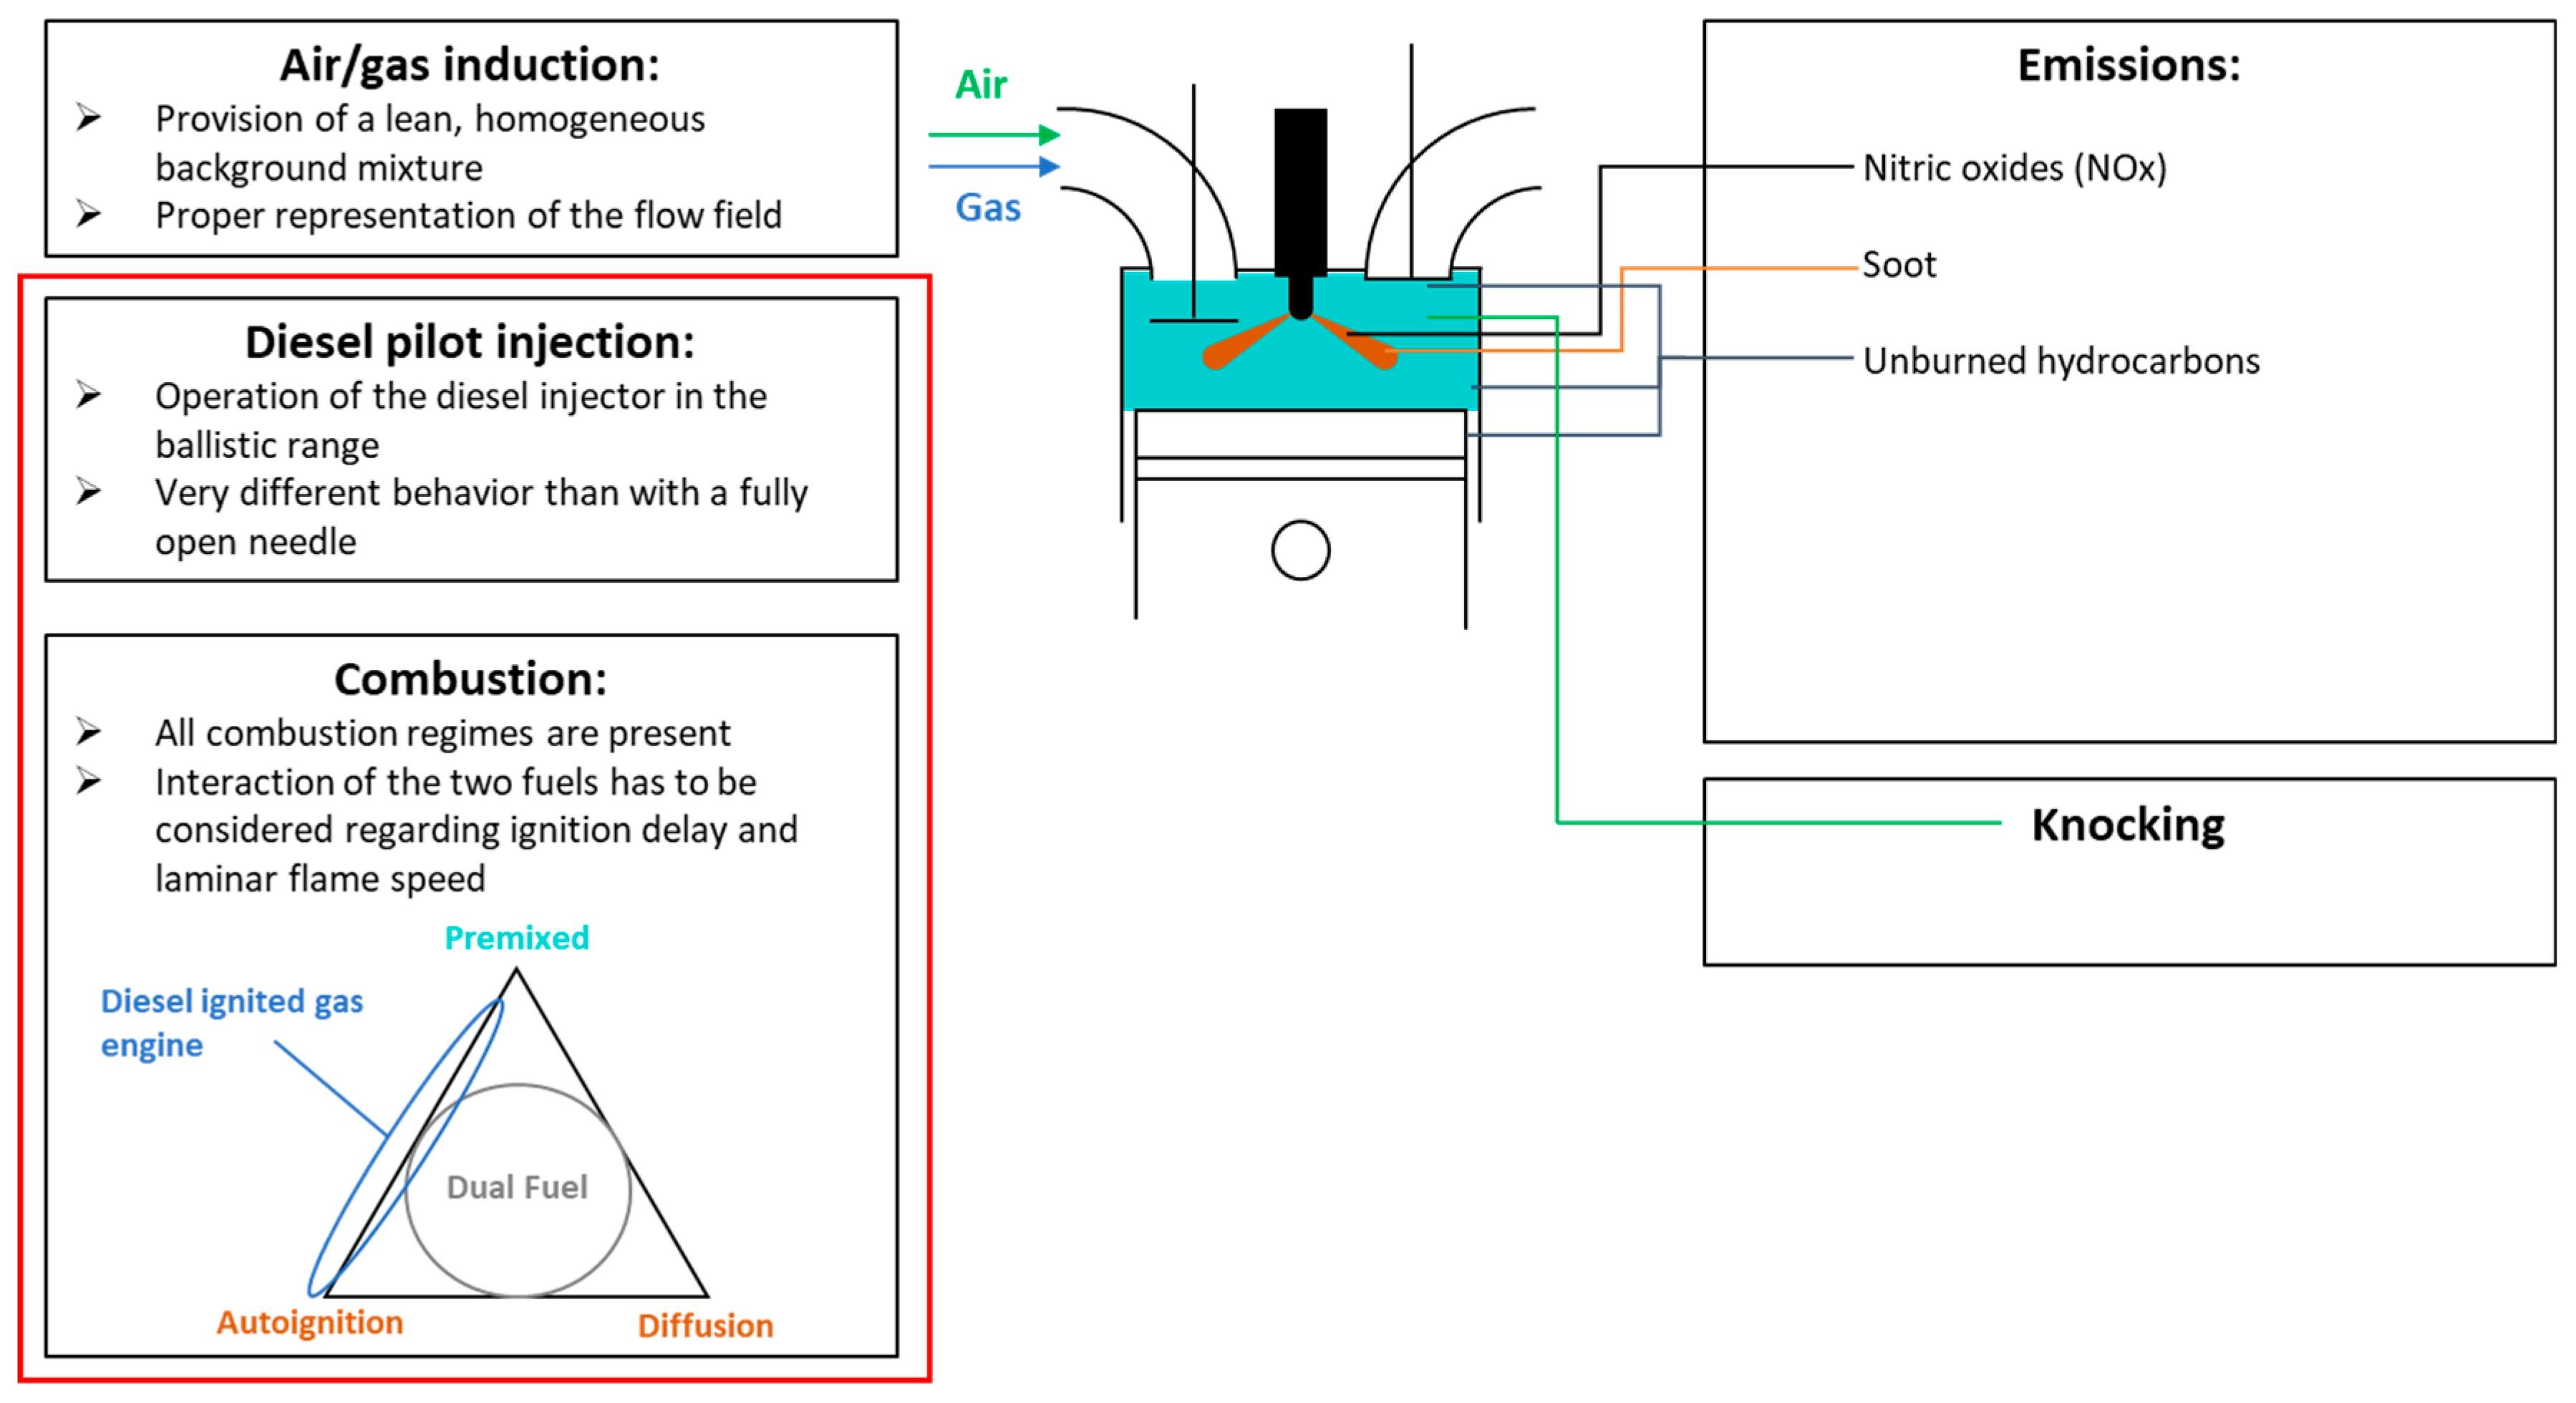 Gasoline Engine Diagram Energies Free Full Text Of Gasoline Engine Diagram